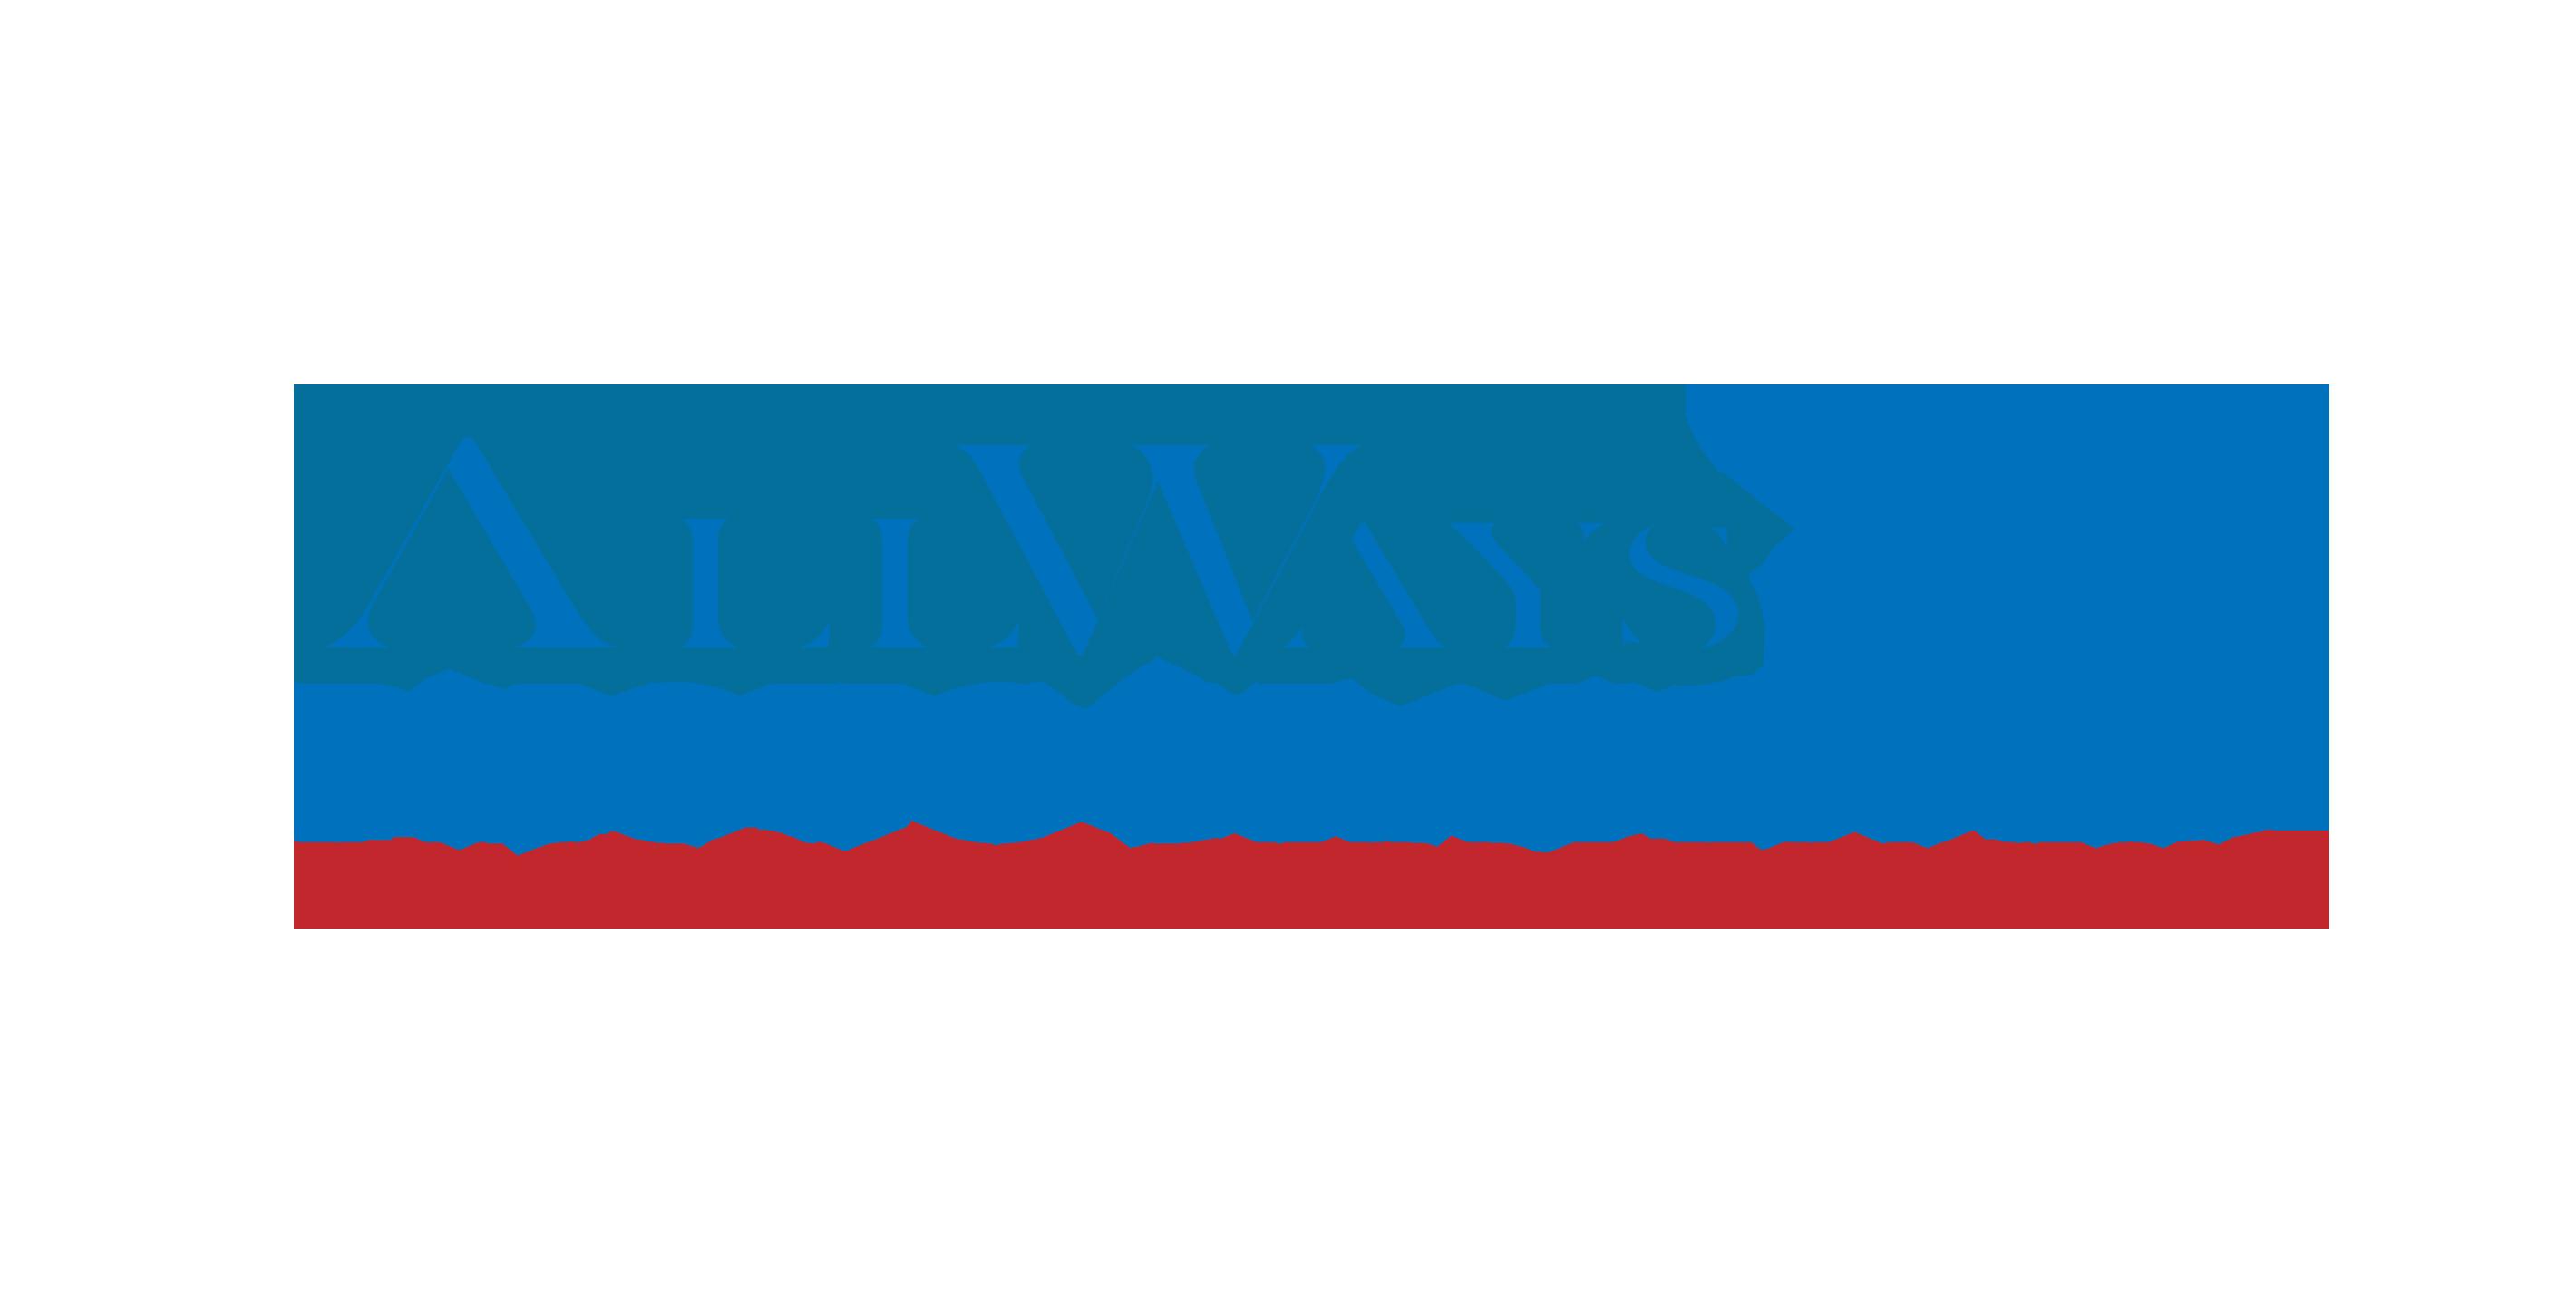 Dev.Allways3D.com